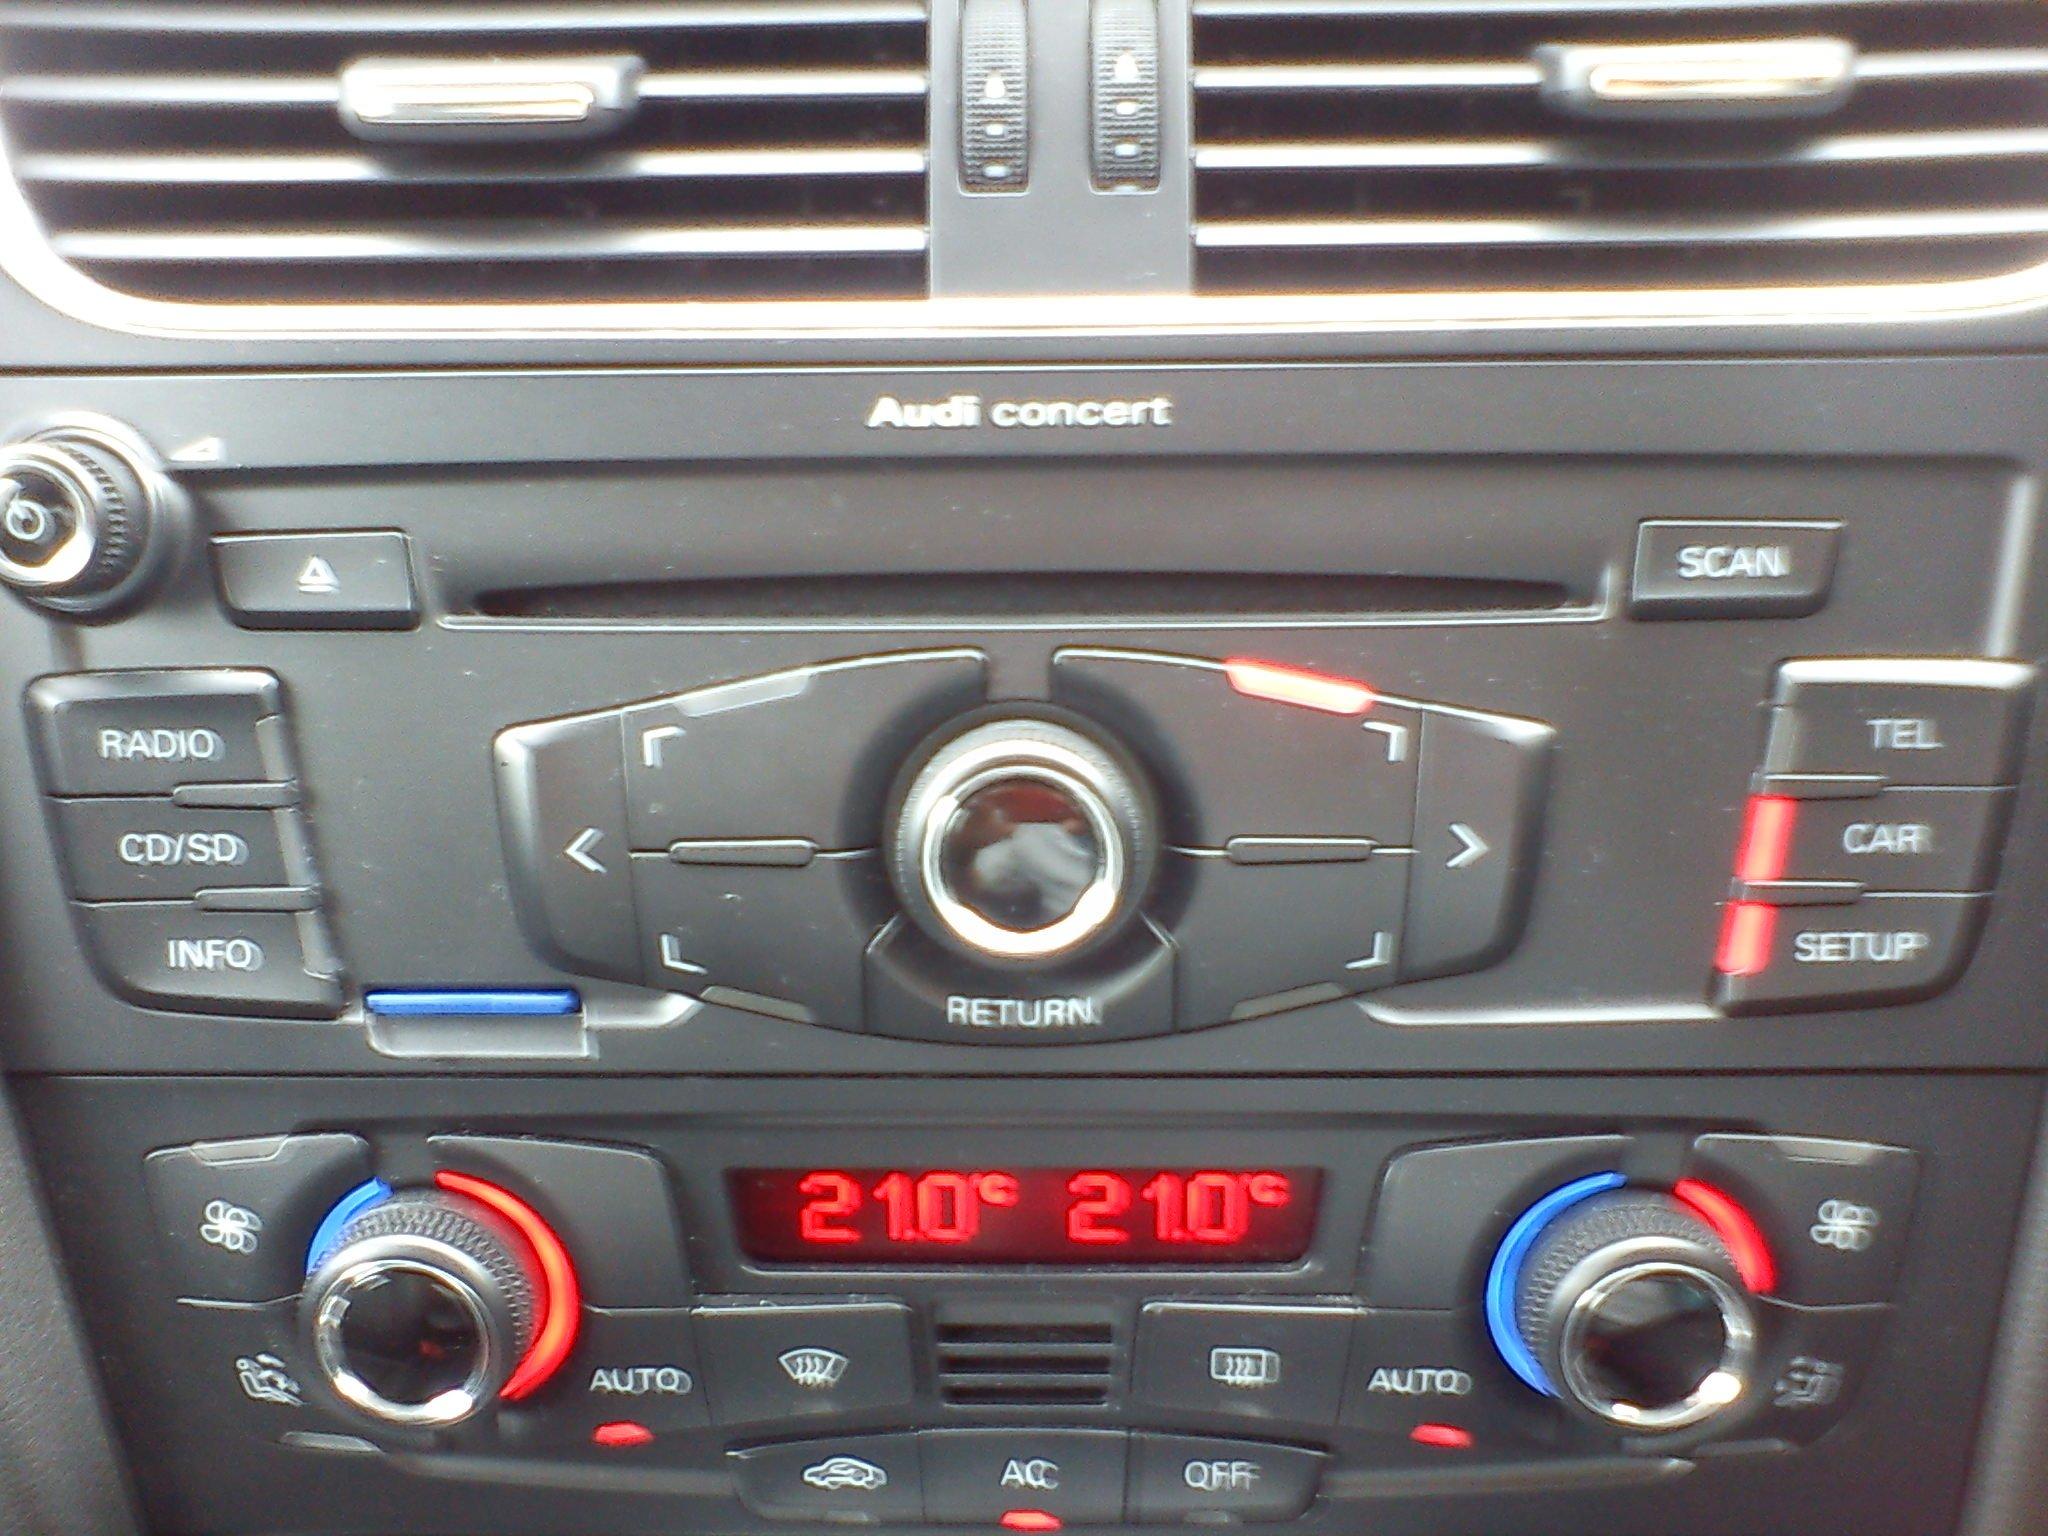 Concert Radio Head Unit | Audi A5 Forum & Audi S5 Forum